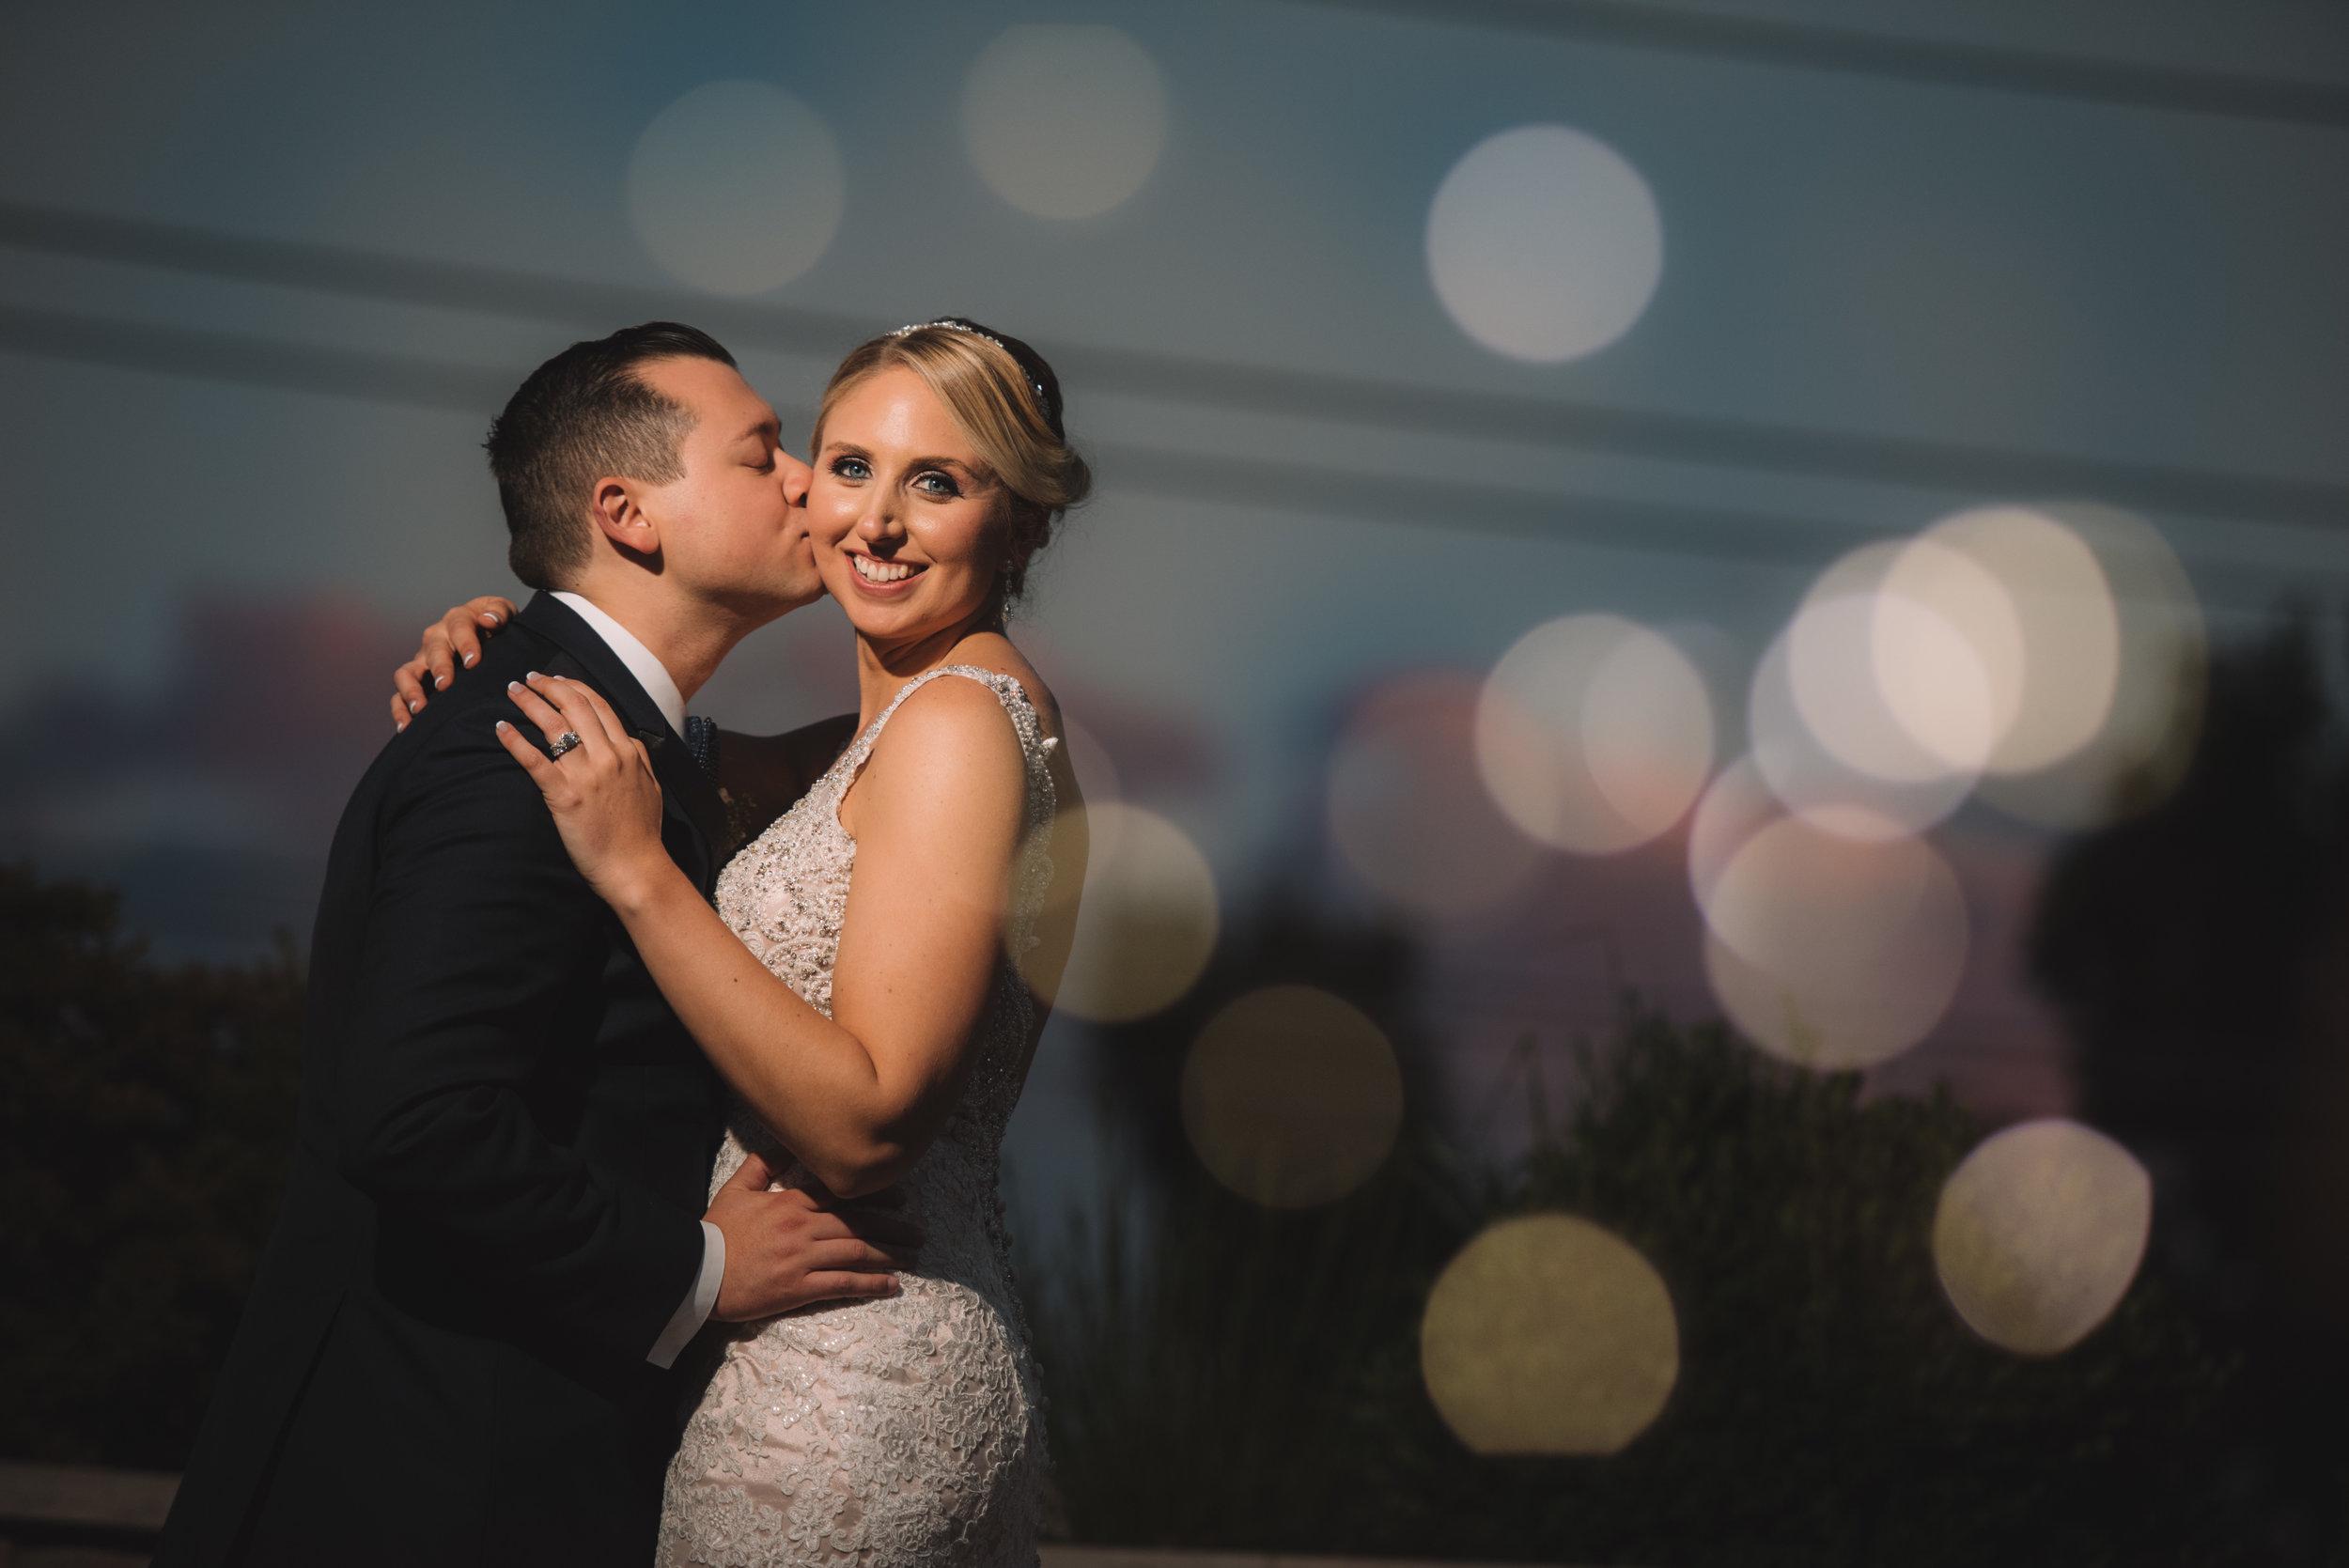 WeddingPhotos | NJPhotographer | Highlights-10-22.jpg